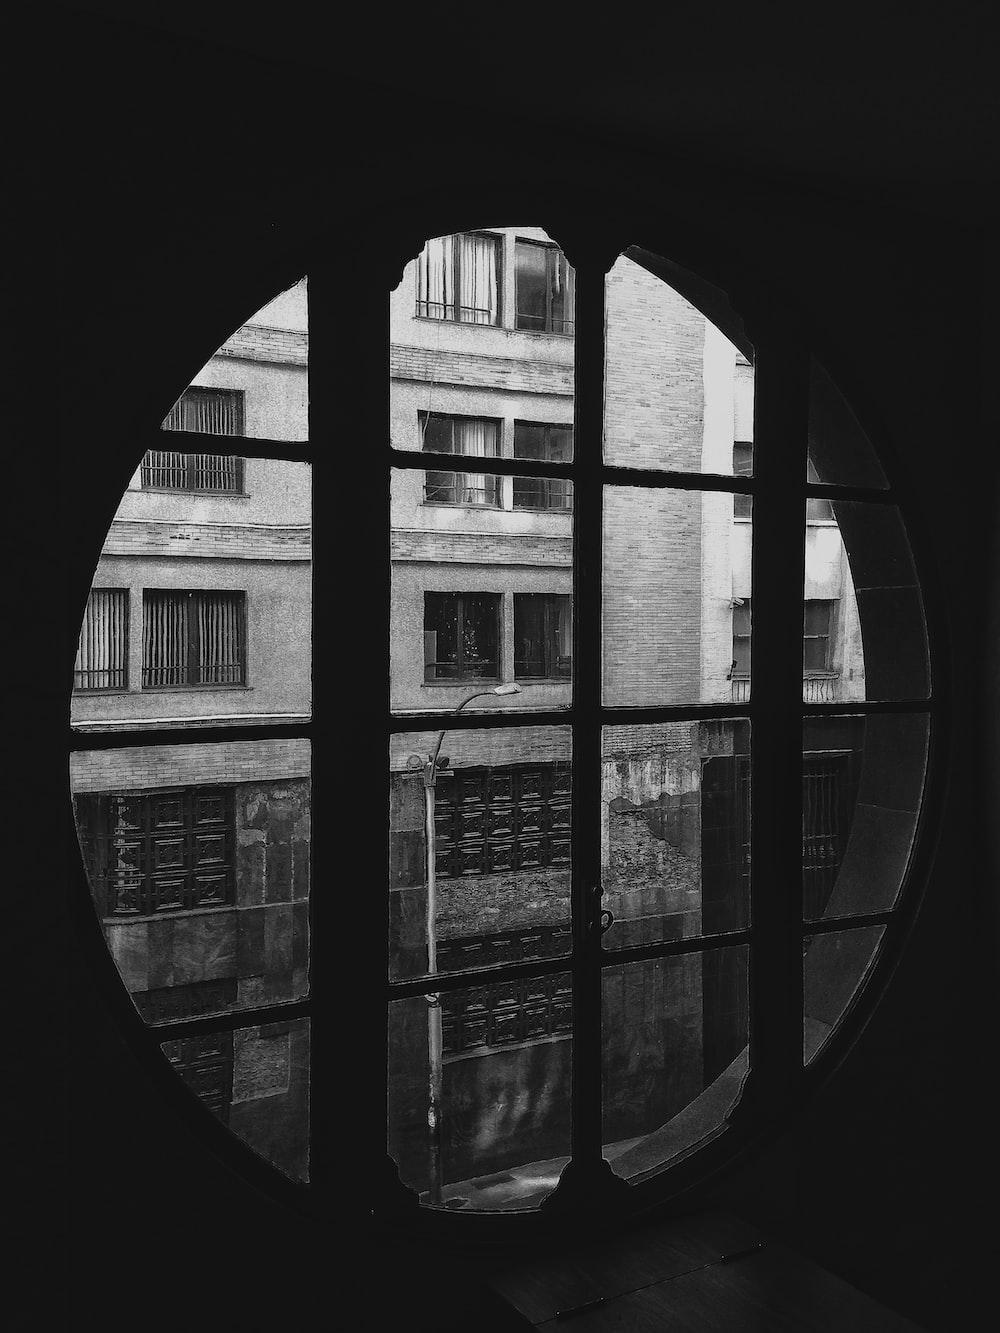 grayscale photo of glass window